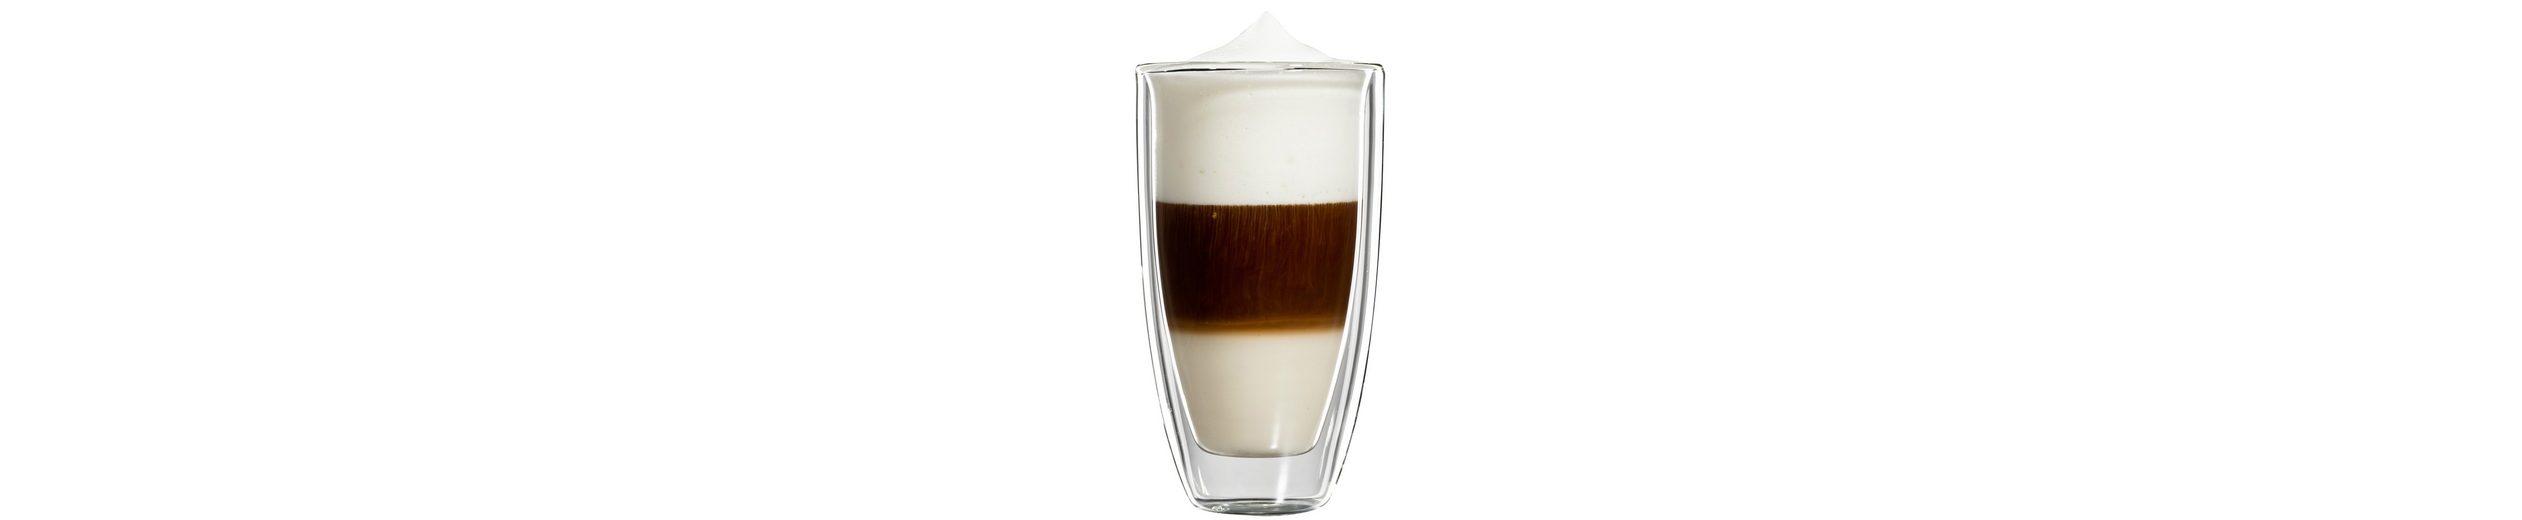 bloomix Latte Macchiato-Glas, 4er Set, »Roma Grande«, 350 ml